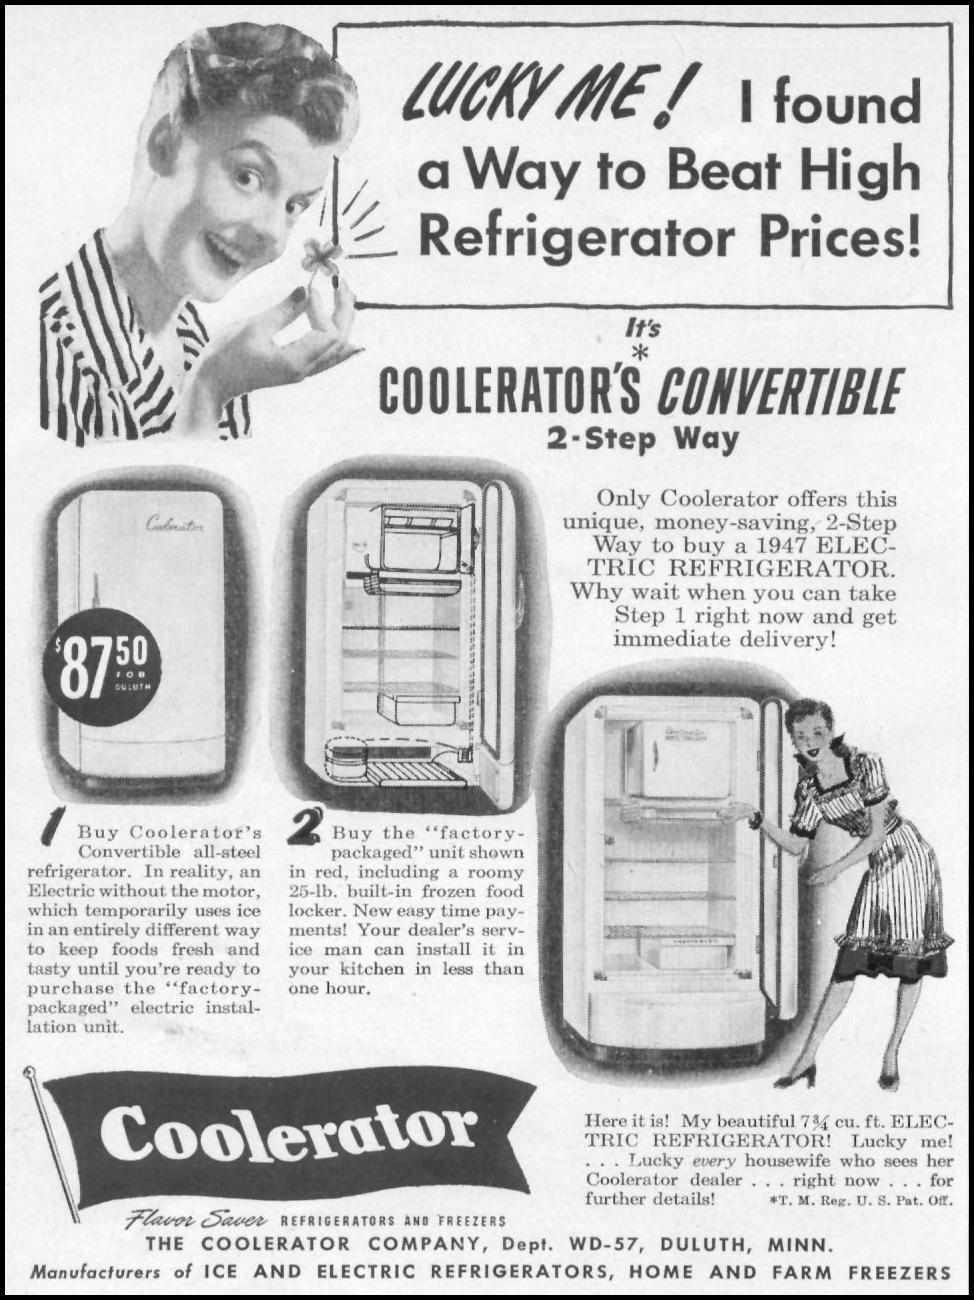 COOLERATOR CONVERTIBLE REFRIGERATOR-FREEZER WOMAN'S DAY 05/01/1947 p. 74